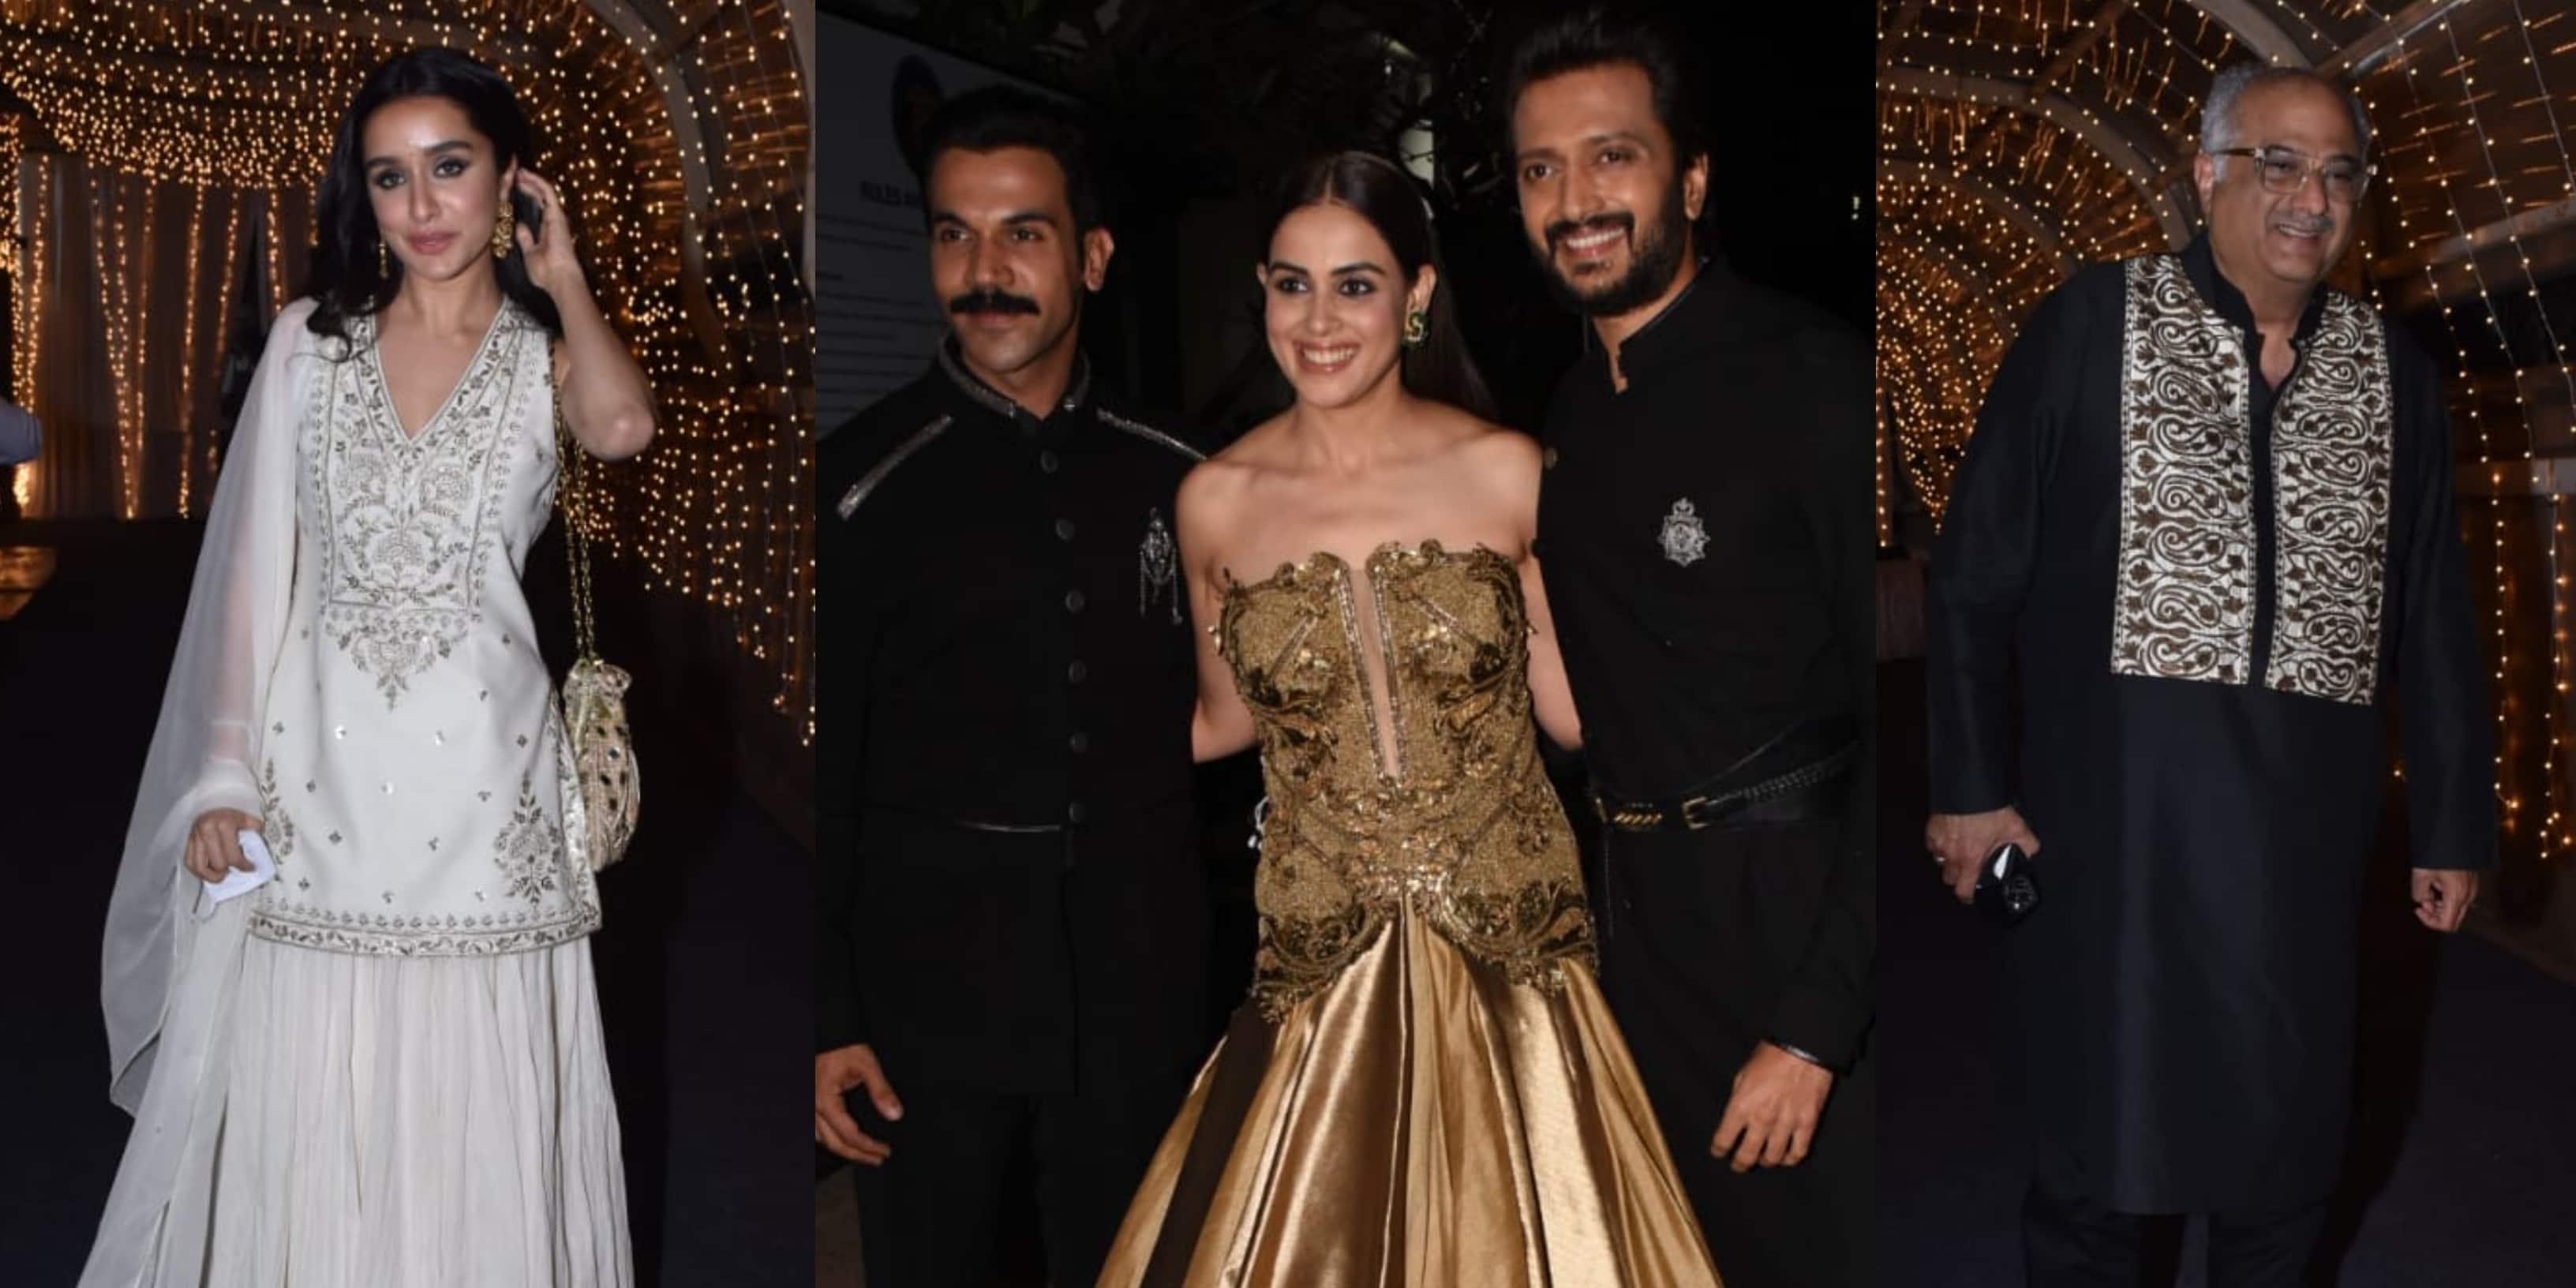 Priyaank Sharma-Shaza Morani Wedding Bash: Shraddha-Rohan Make Heads Turn; Rajkummar Rao, Sunny Deol And Other Celebs In Attendance